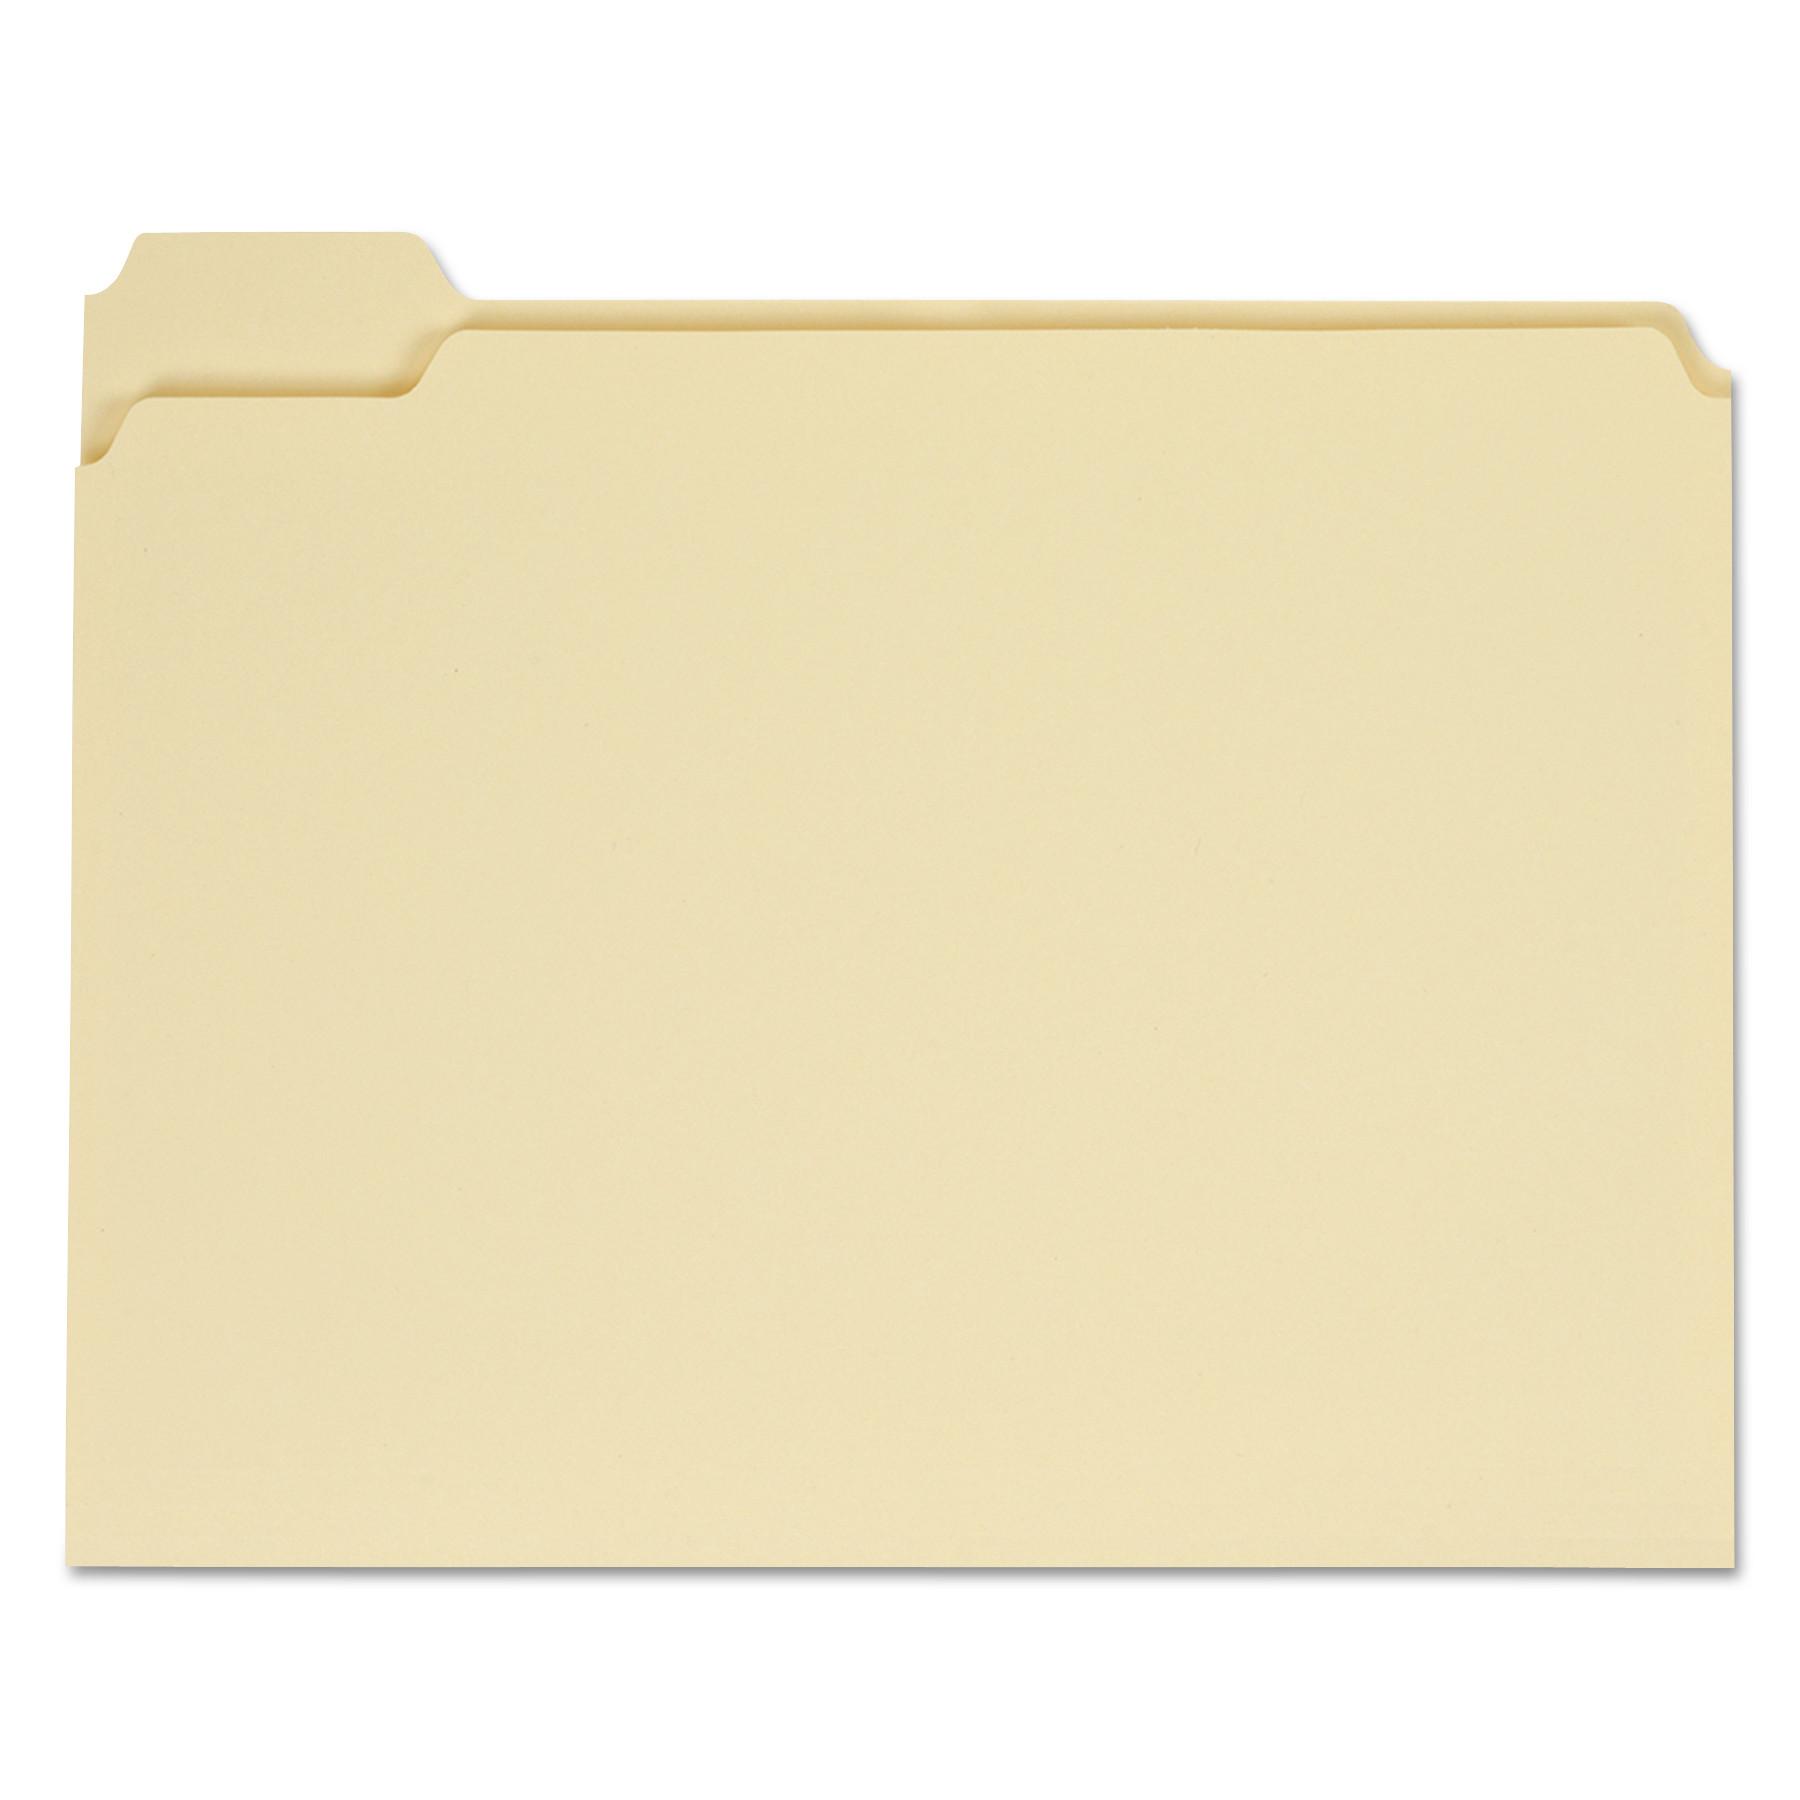 Top Tab Manila File Folders, 1/5-Cut Tabs, Assorted Positions, Letter Size, 11 pt. Manila, 100/Box